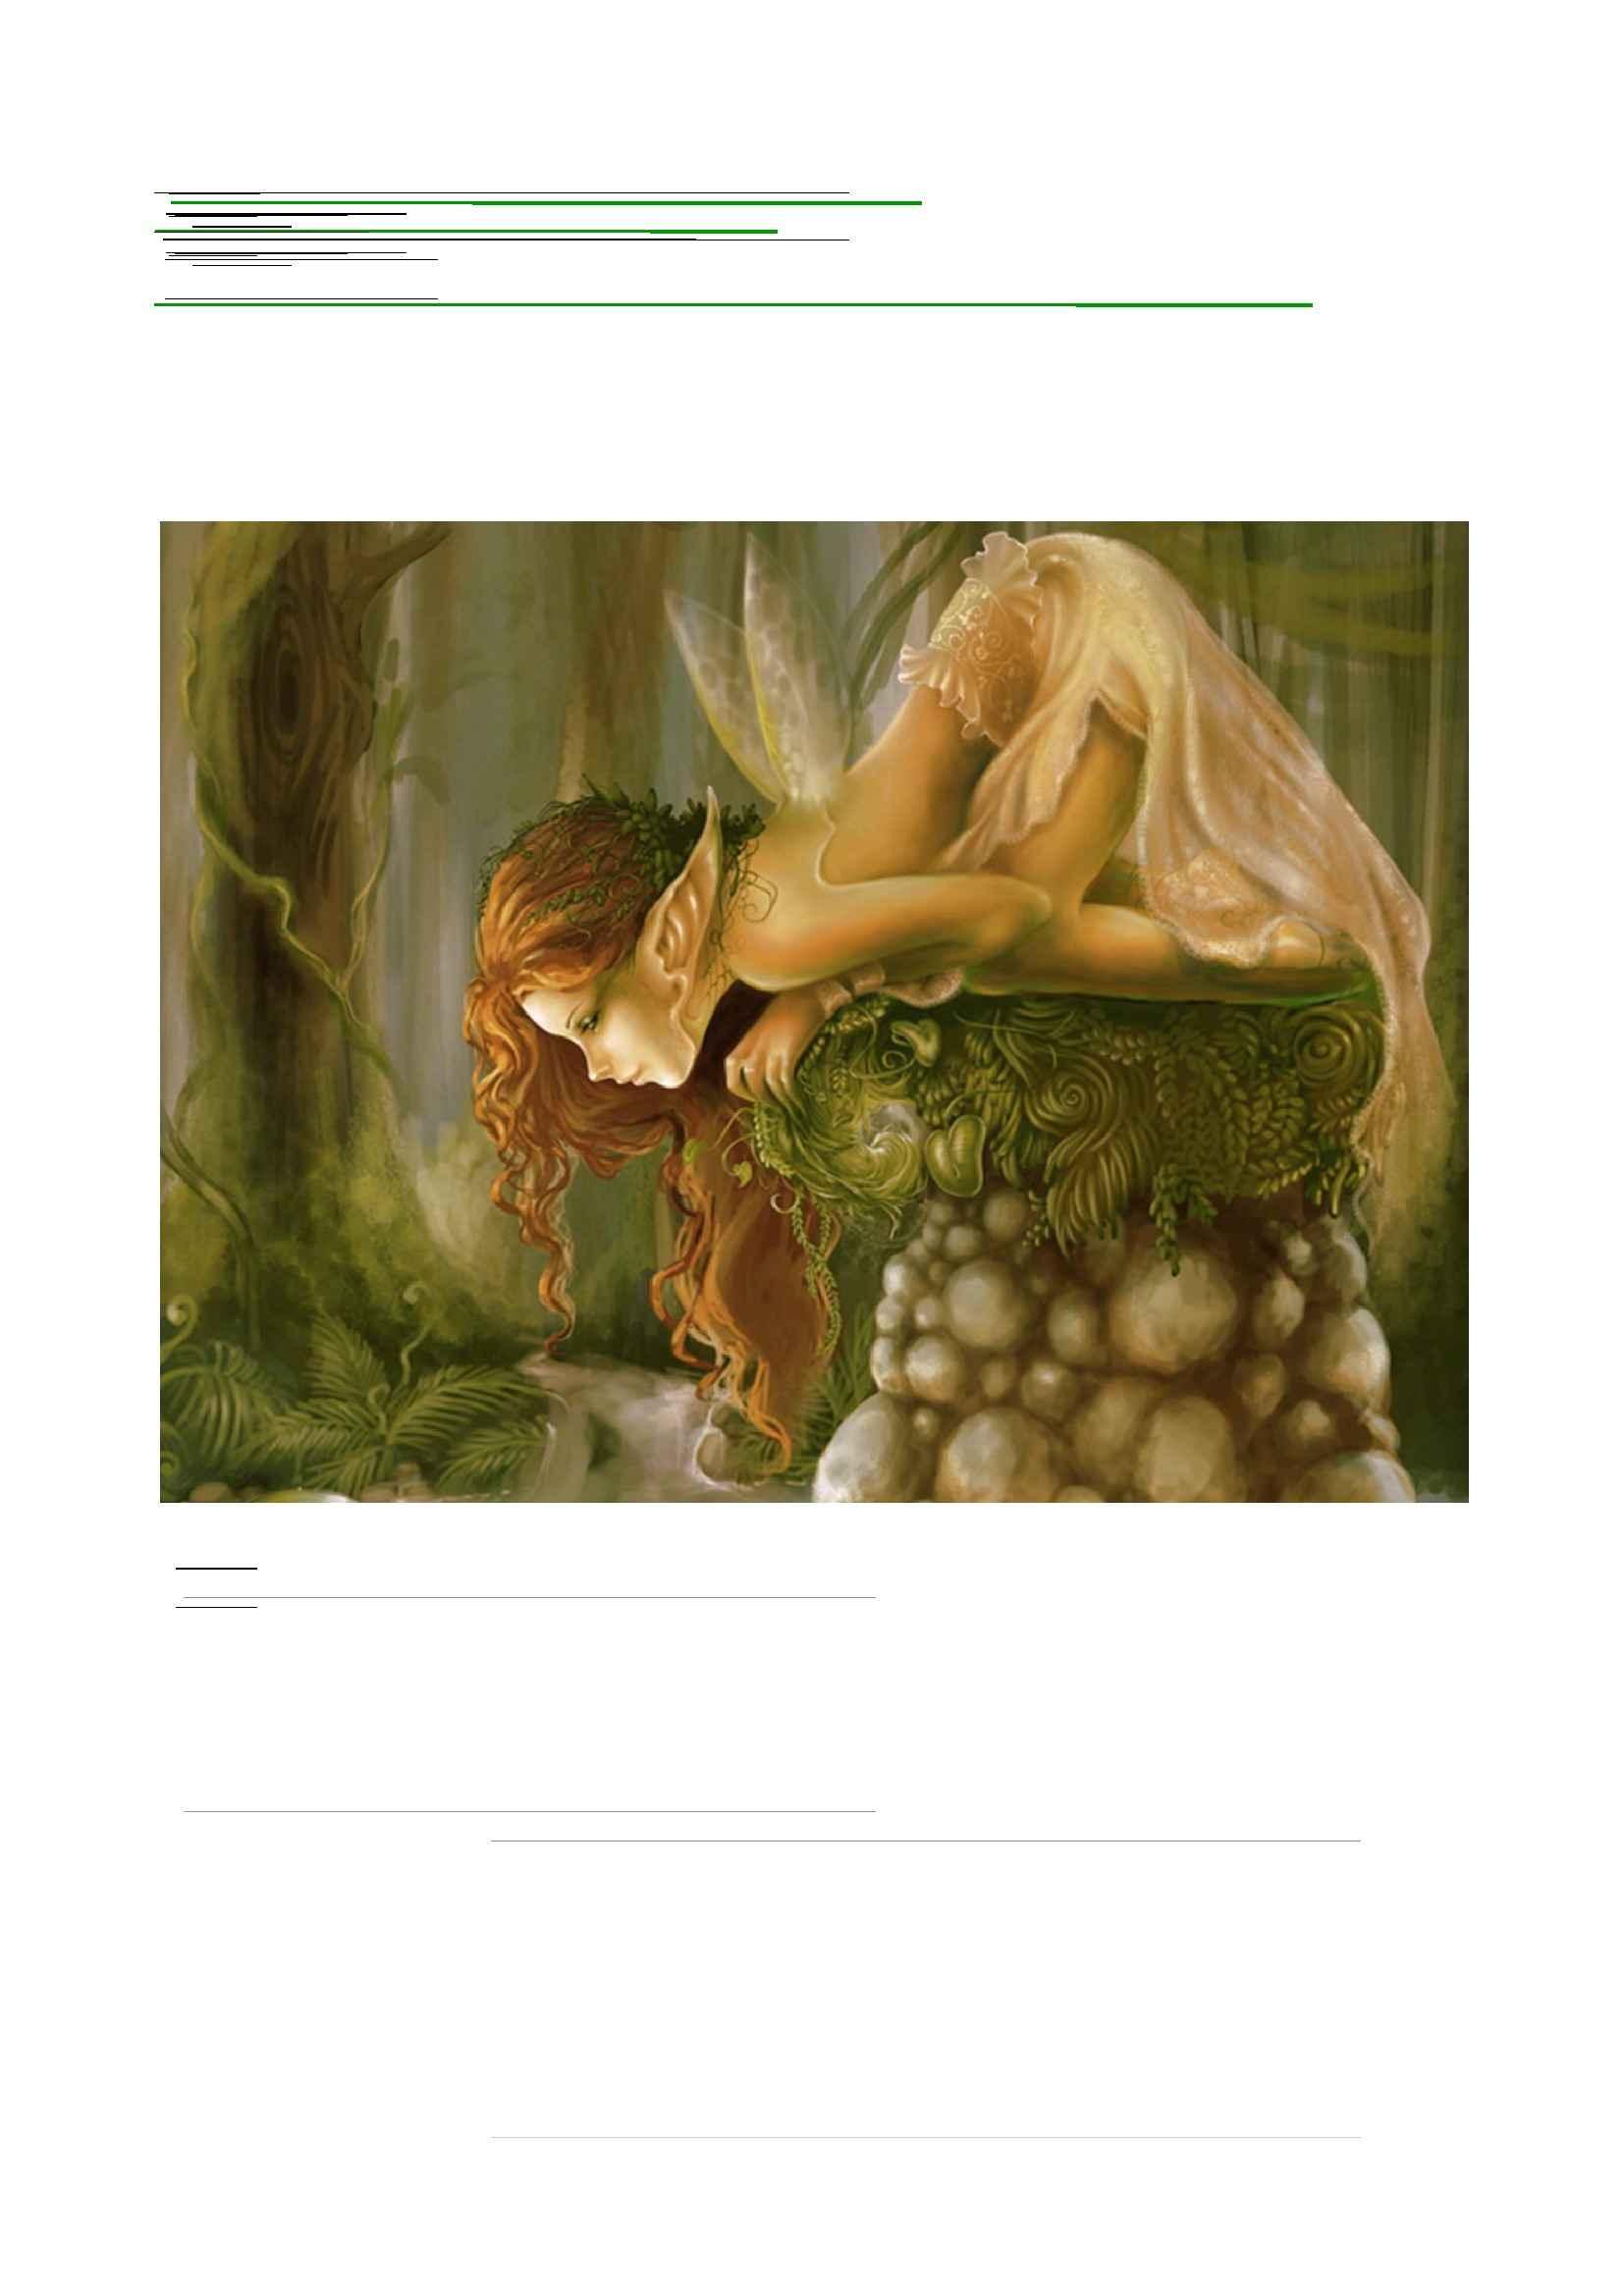 Letteratura tedesca - Deutsche Folklore trifft Fantasy